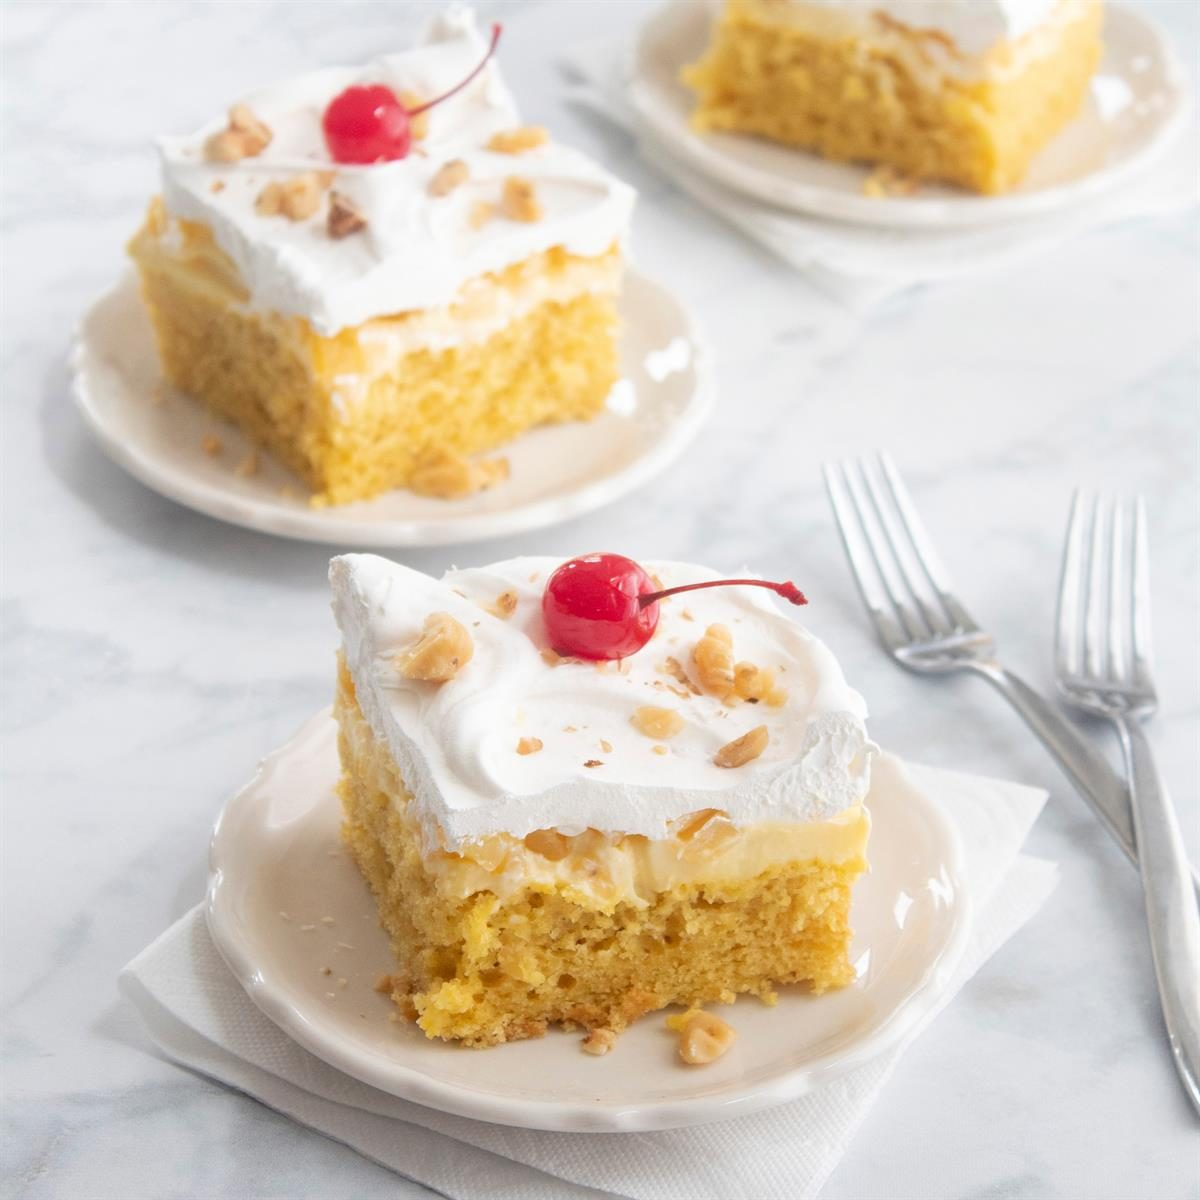 Pineapple Sunshine Cake: Pineapple Pudding Cake Recipe